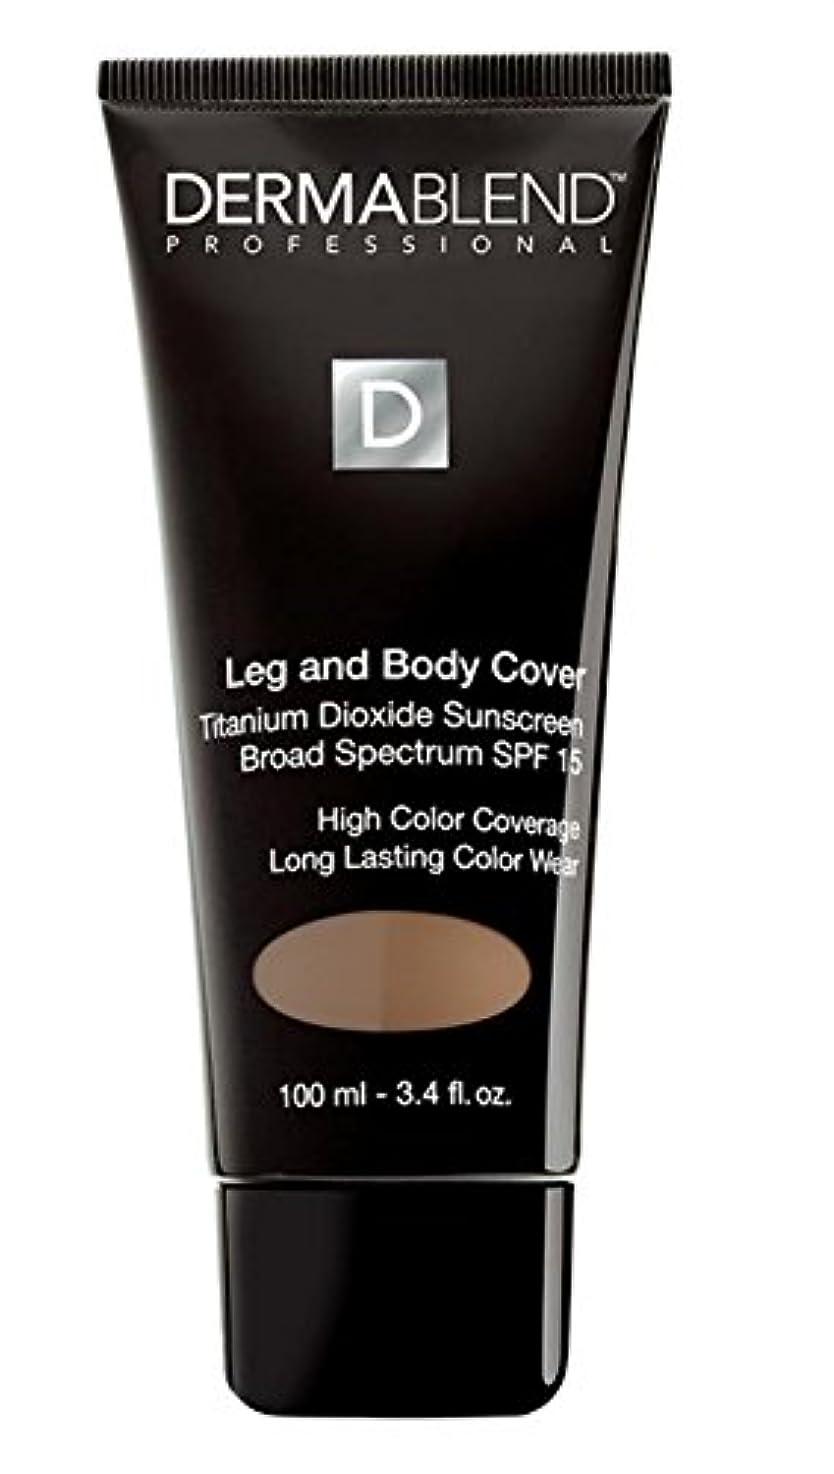 Dermablend Leg And Body Cover Creme Spf 15 - Natural (並行輸入品) [並行輸入品]